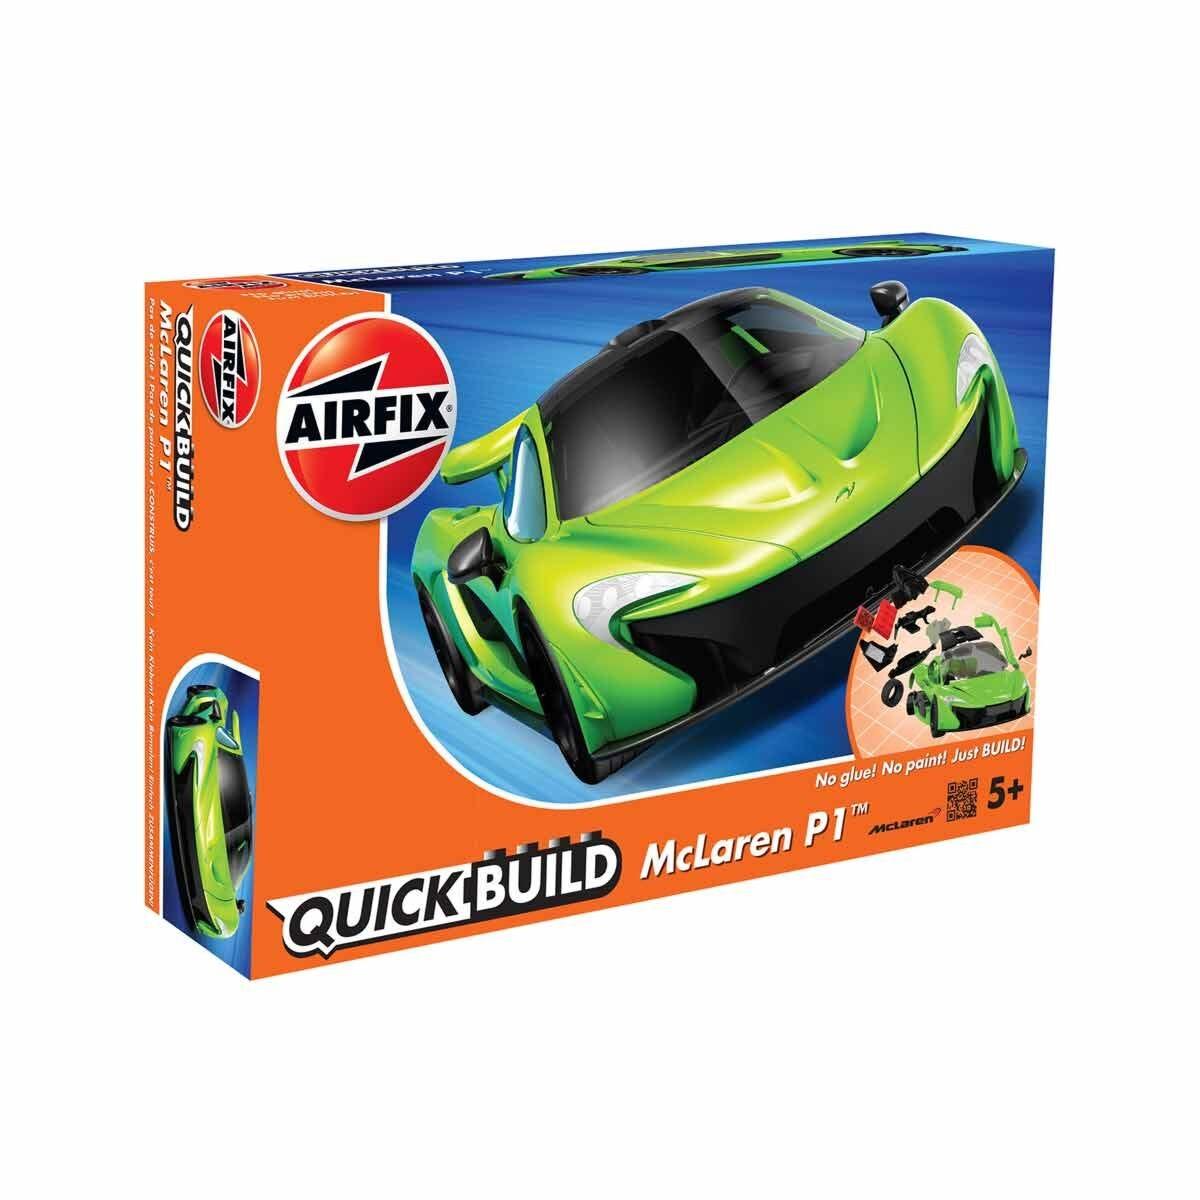 Airfix Quickbuild McLaren P1 Green